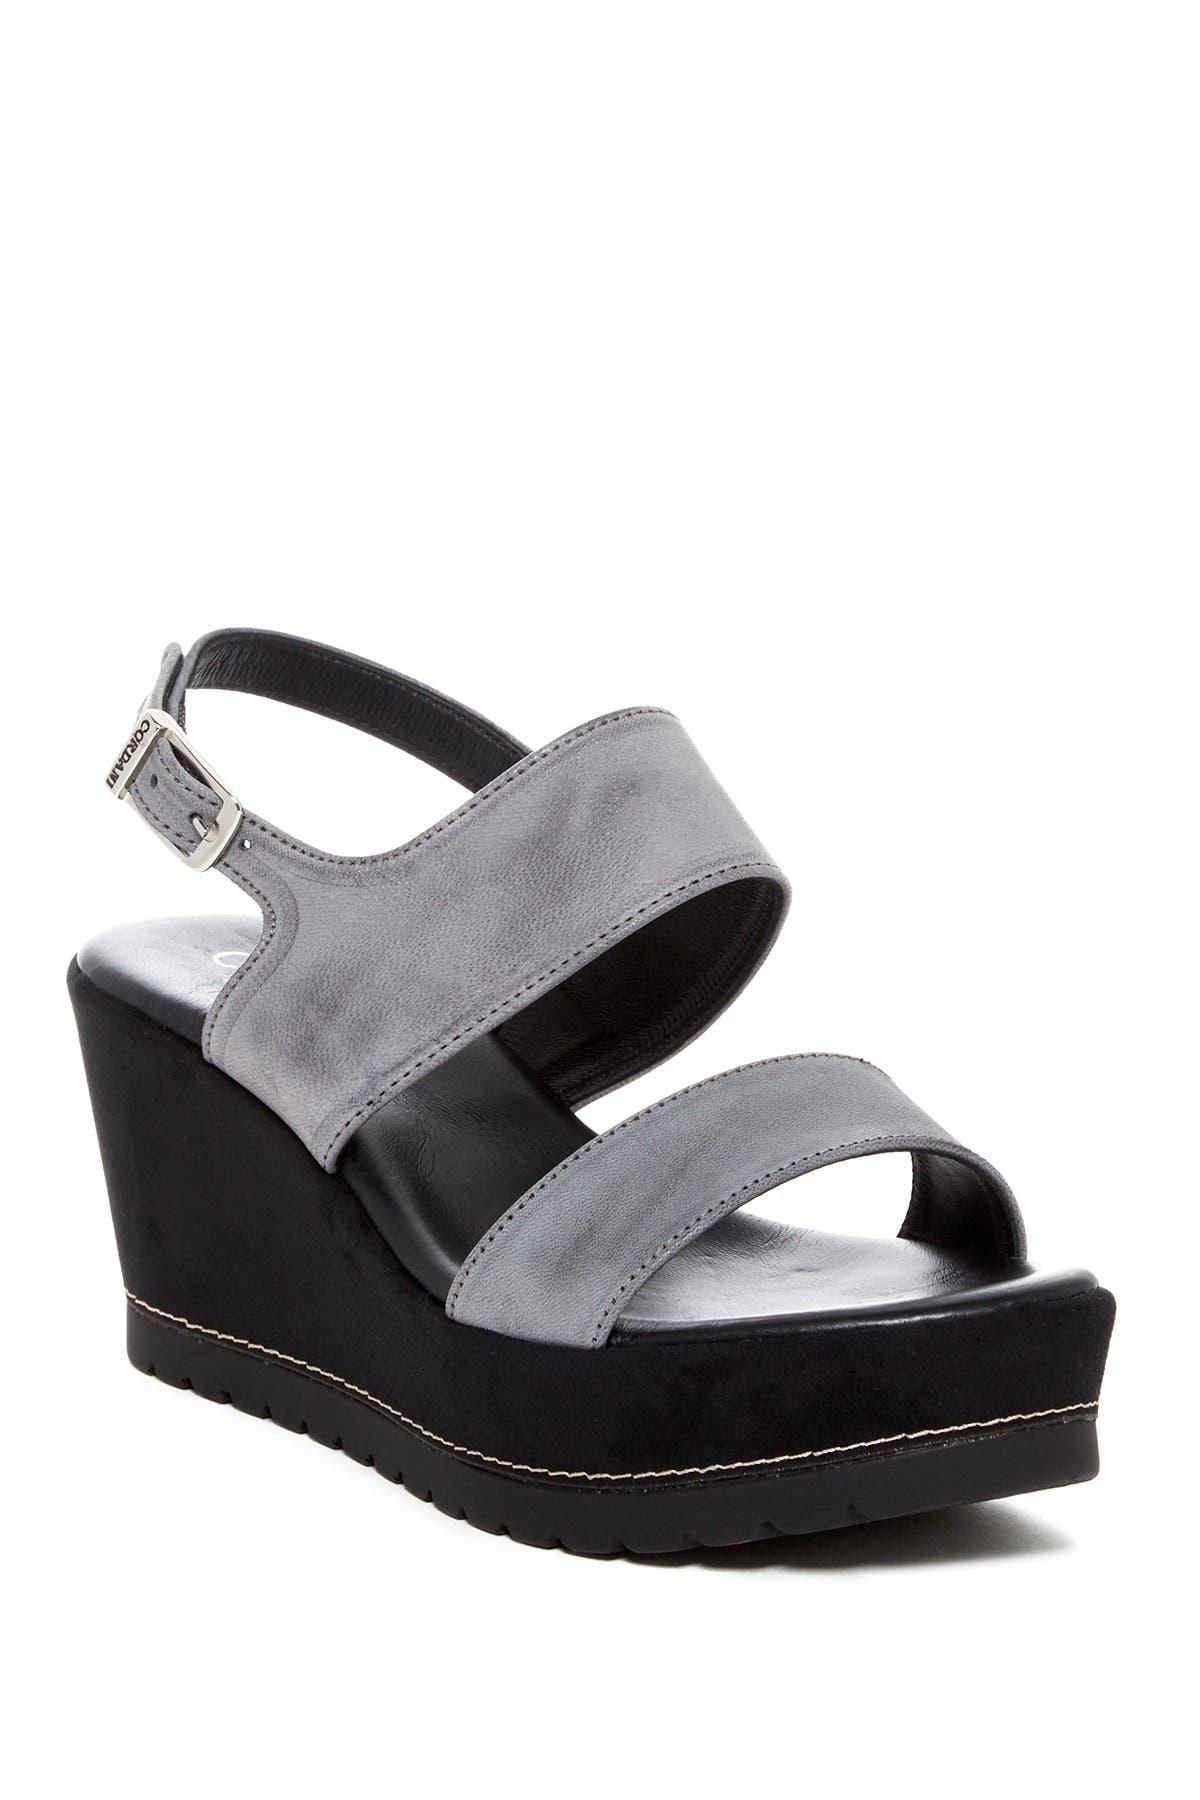 Image of CORDANI Denver Slingback Wedge Sandal